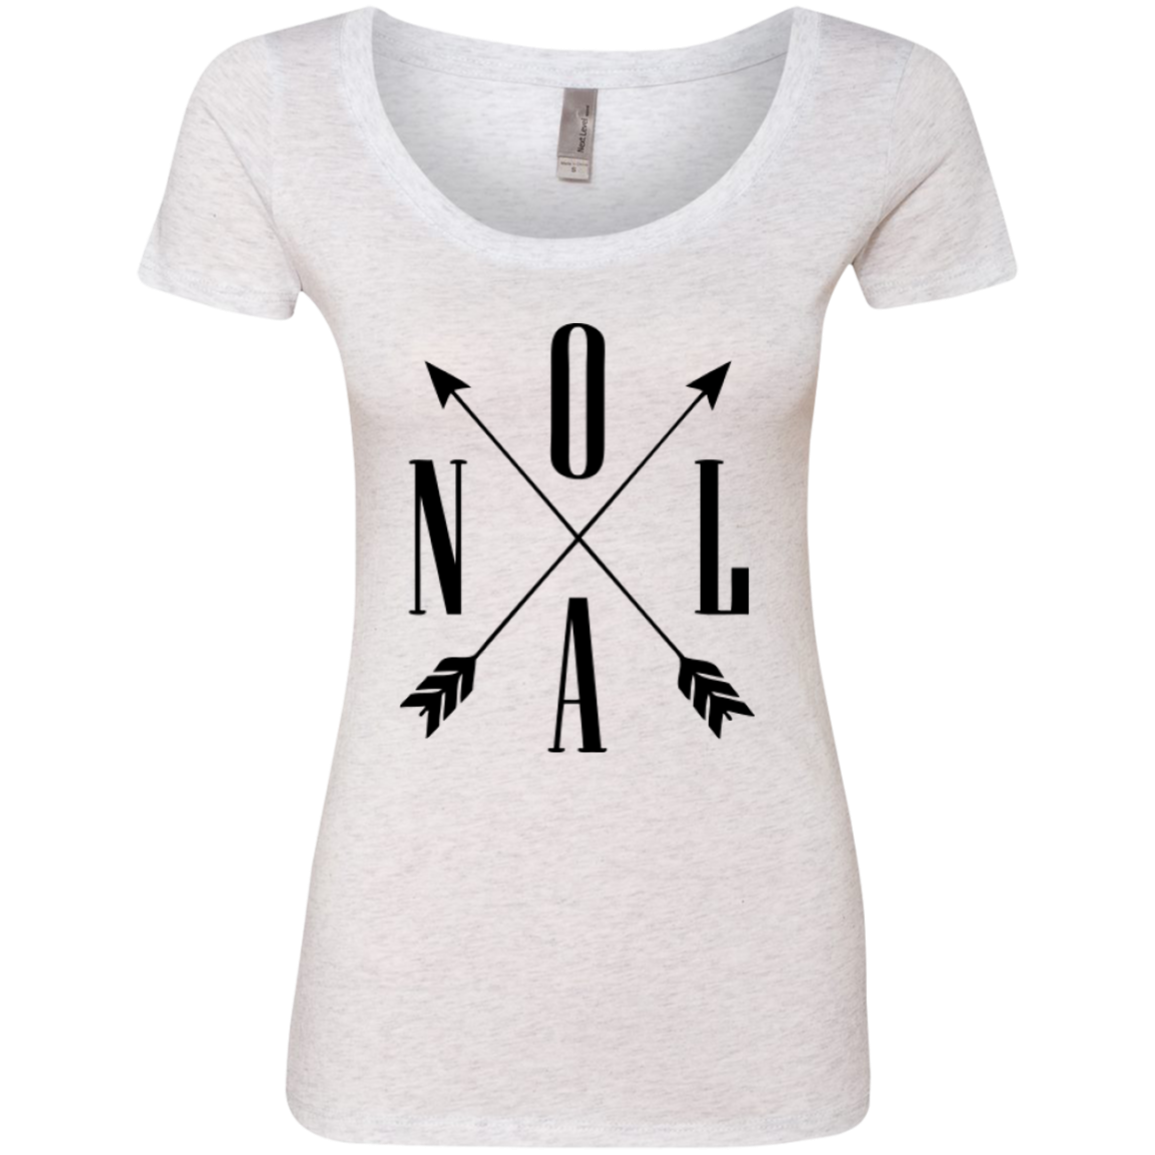 NOLA Arrow Ladies Triblend Scoop Lady, Clothes, Tees